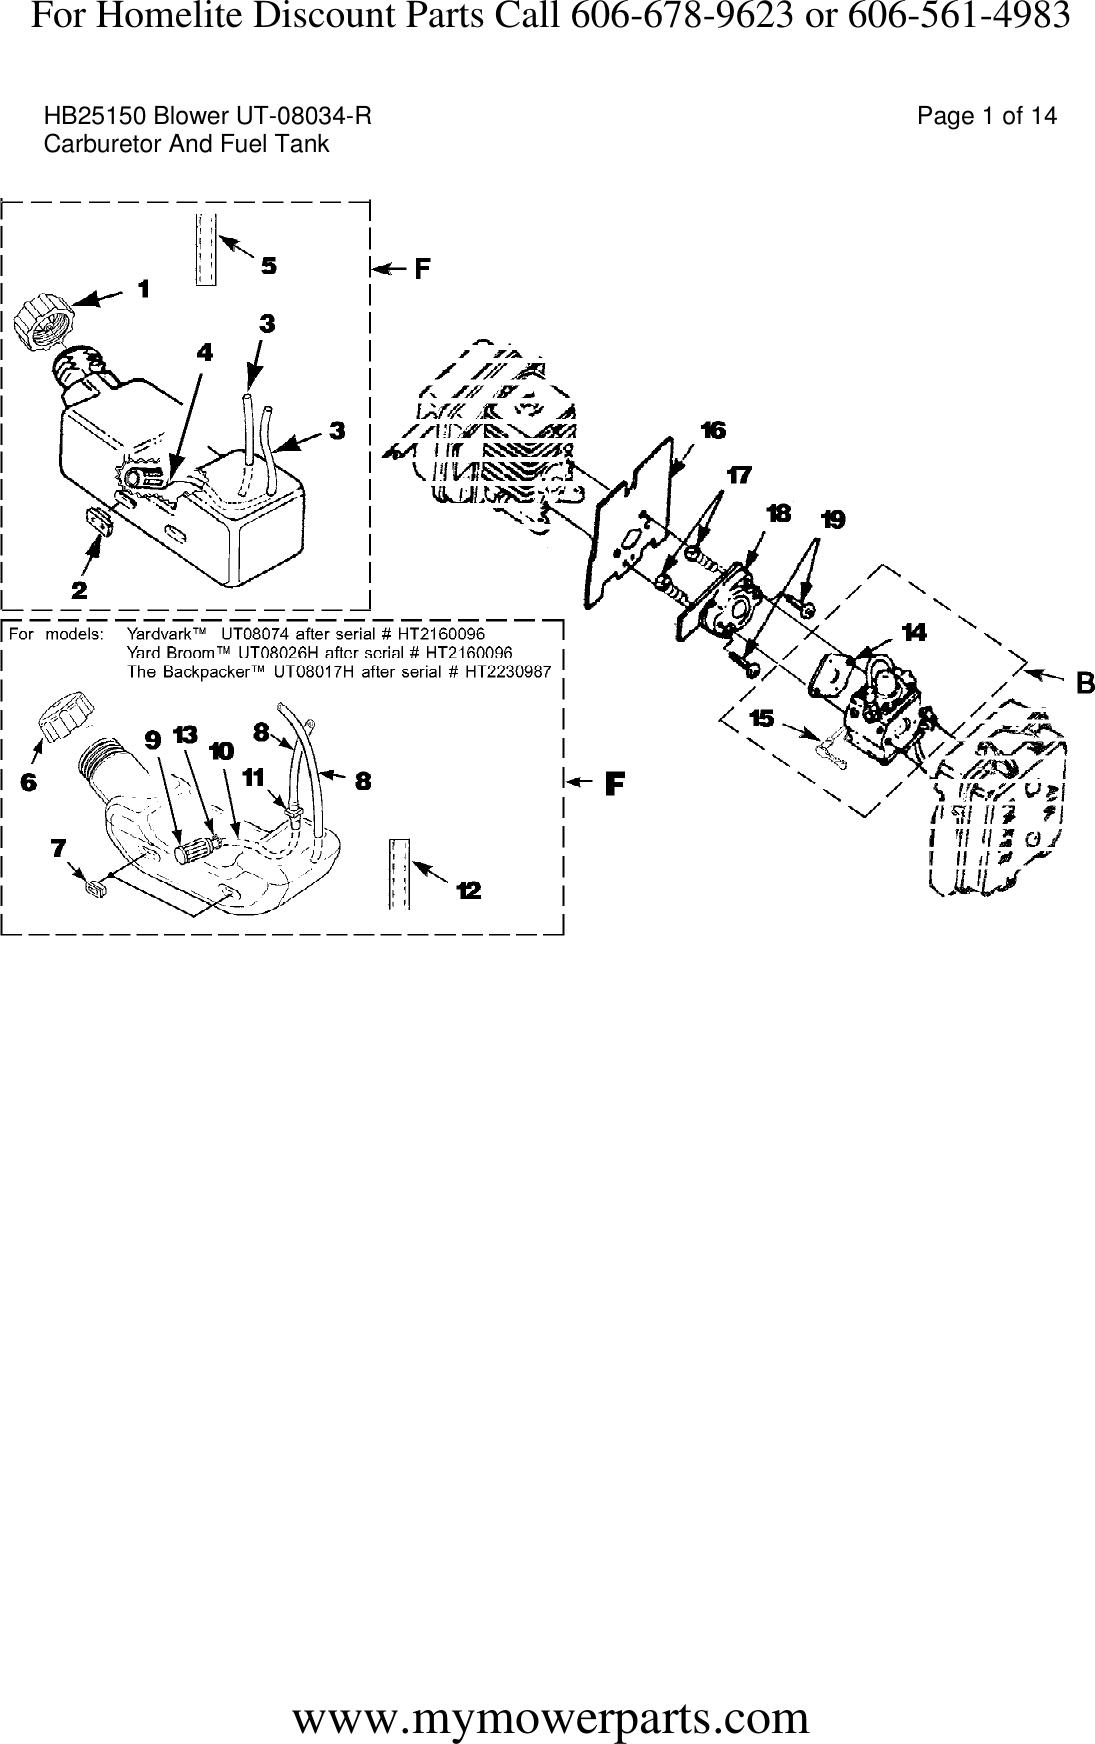 Homelite Fuel Line Diagram